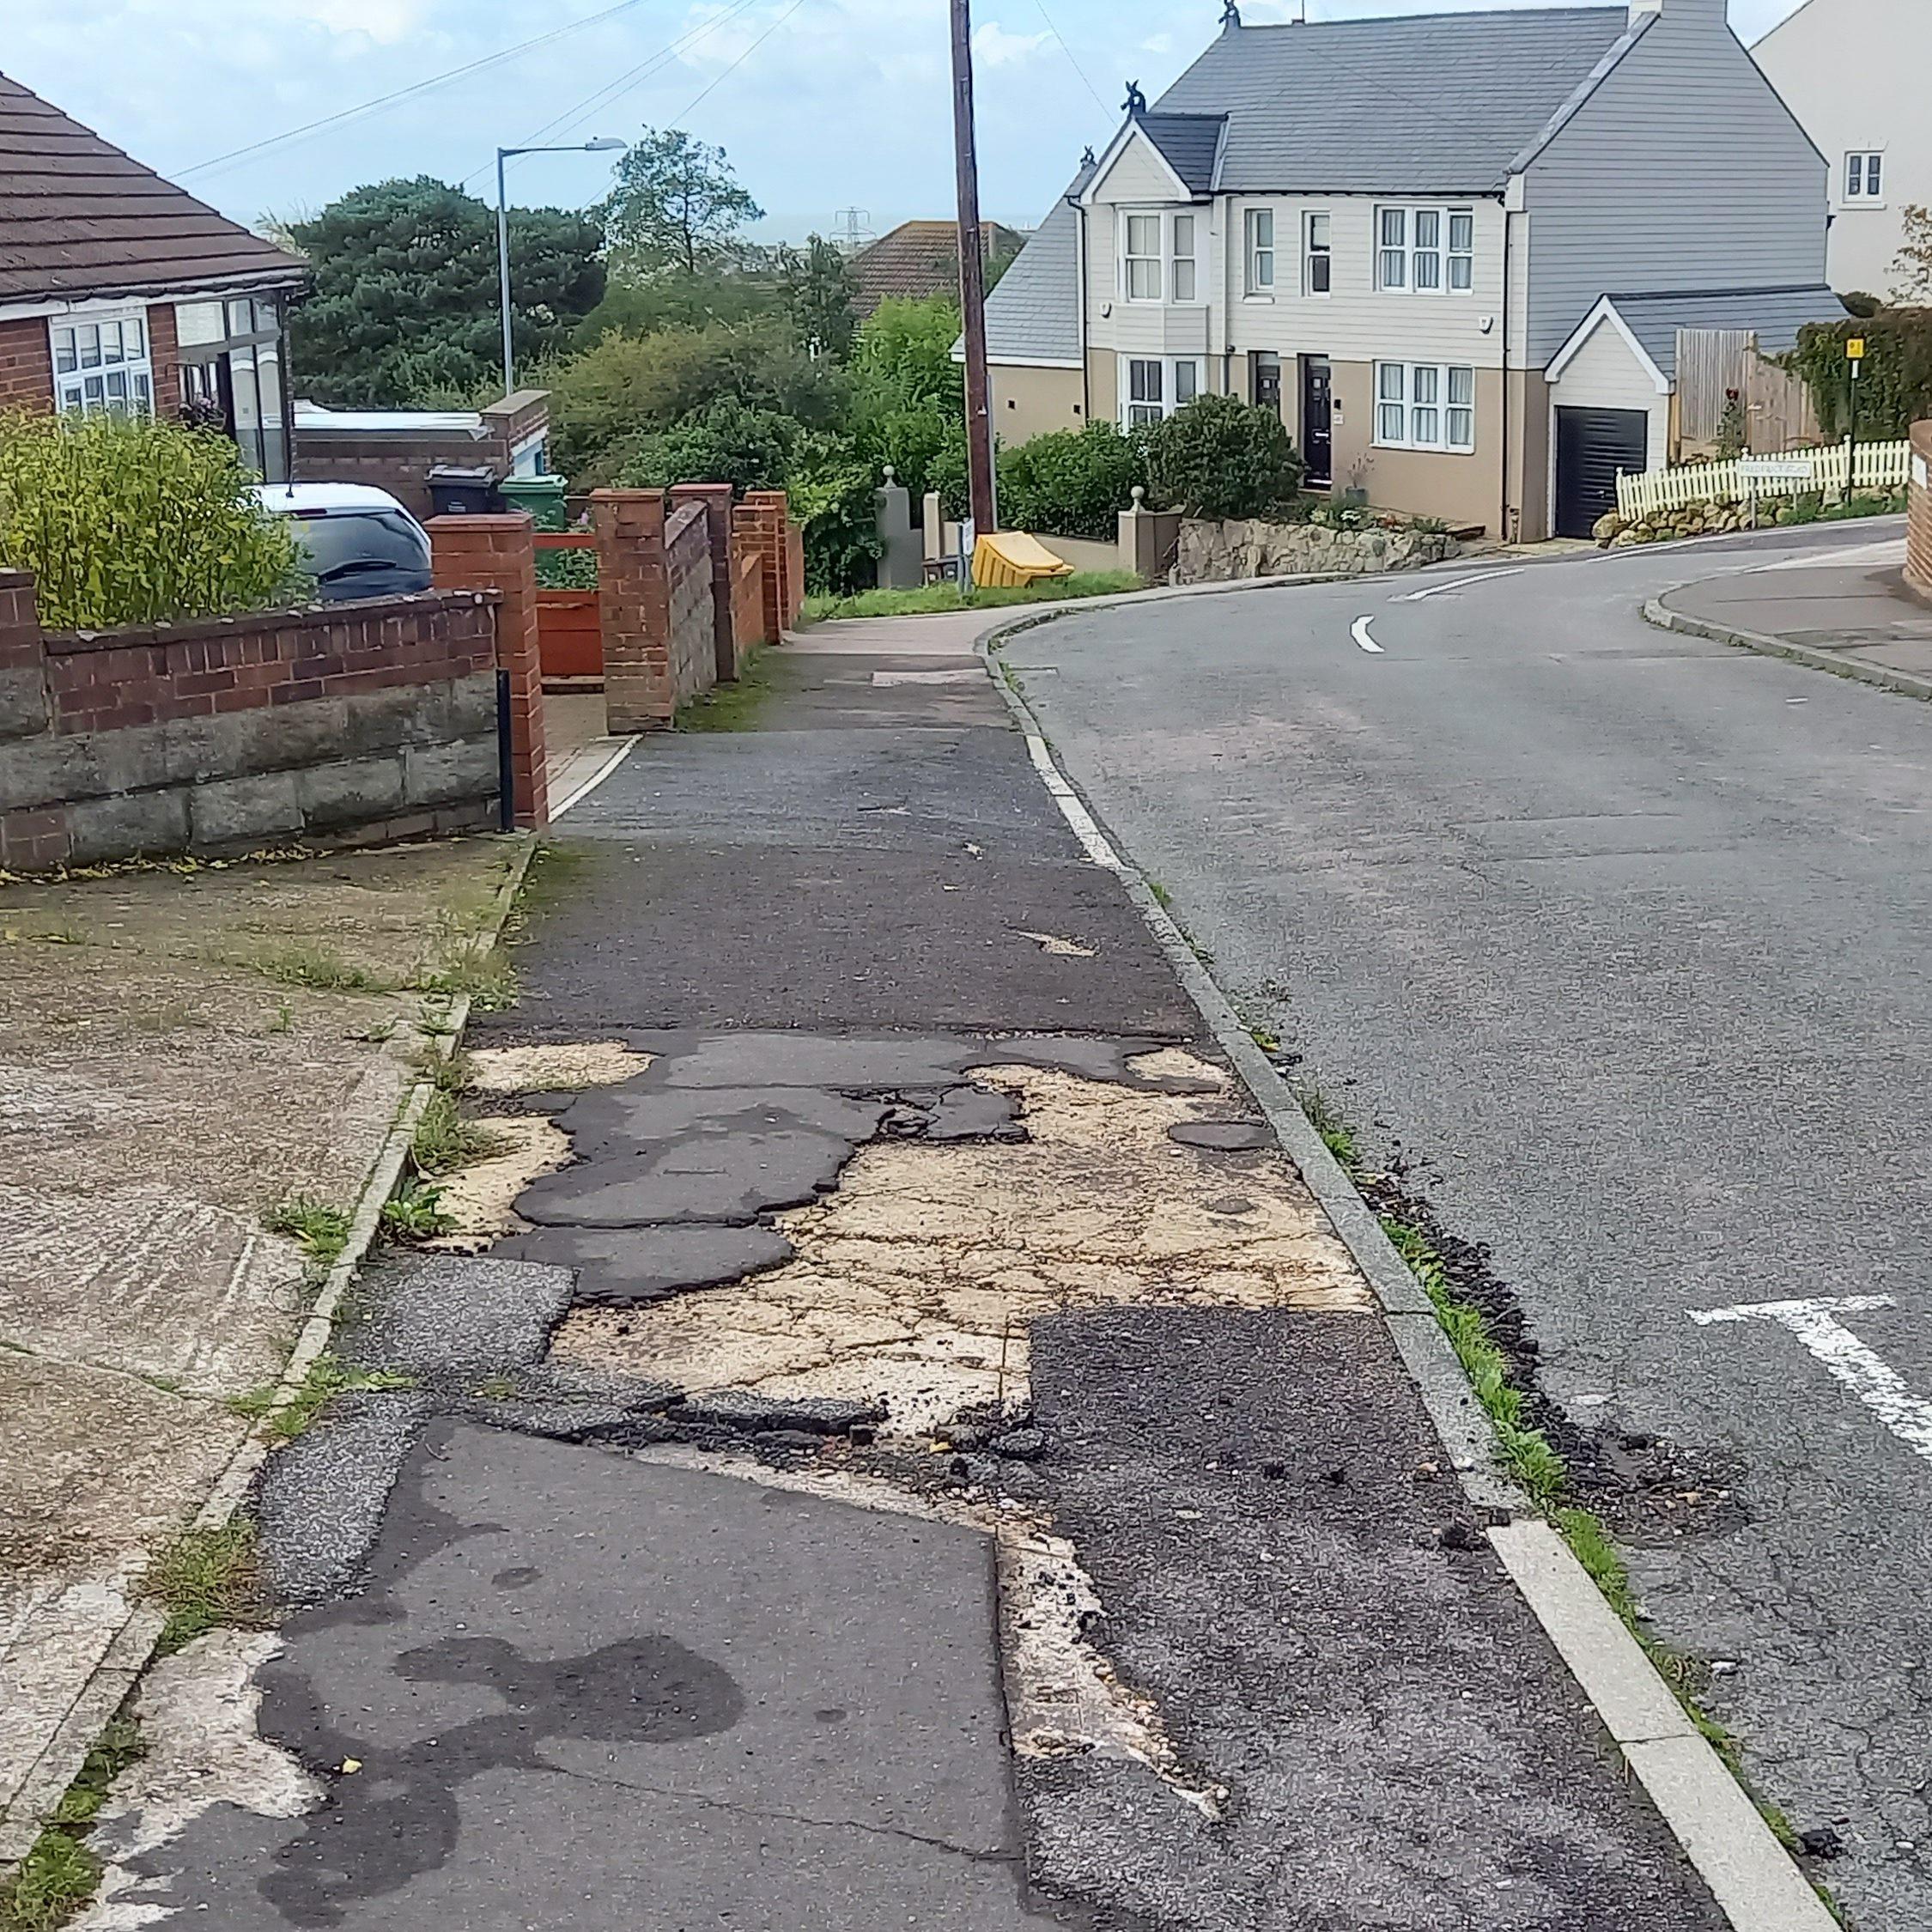 Damaged footways in Coghurst Road